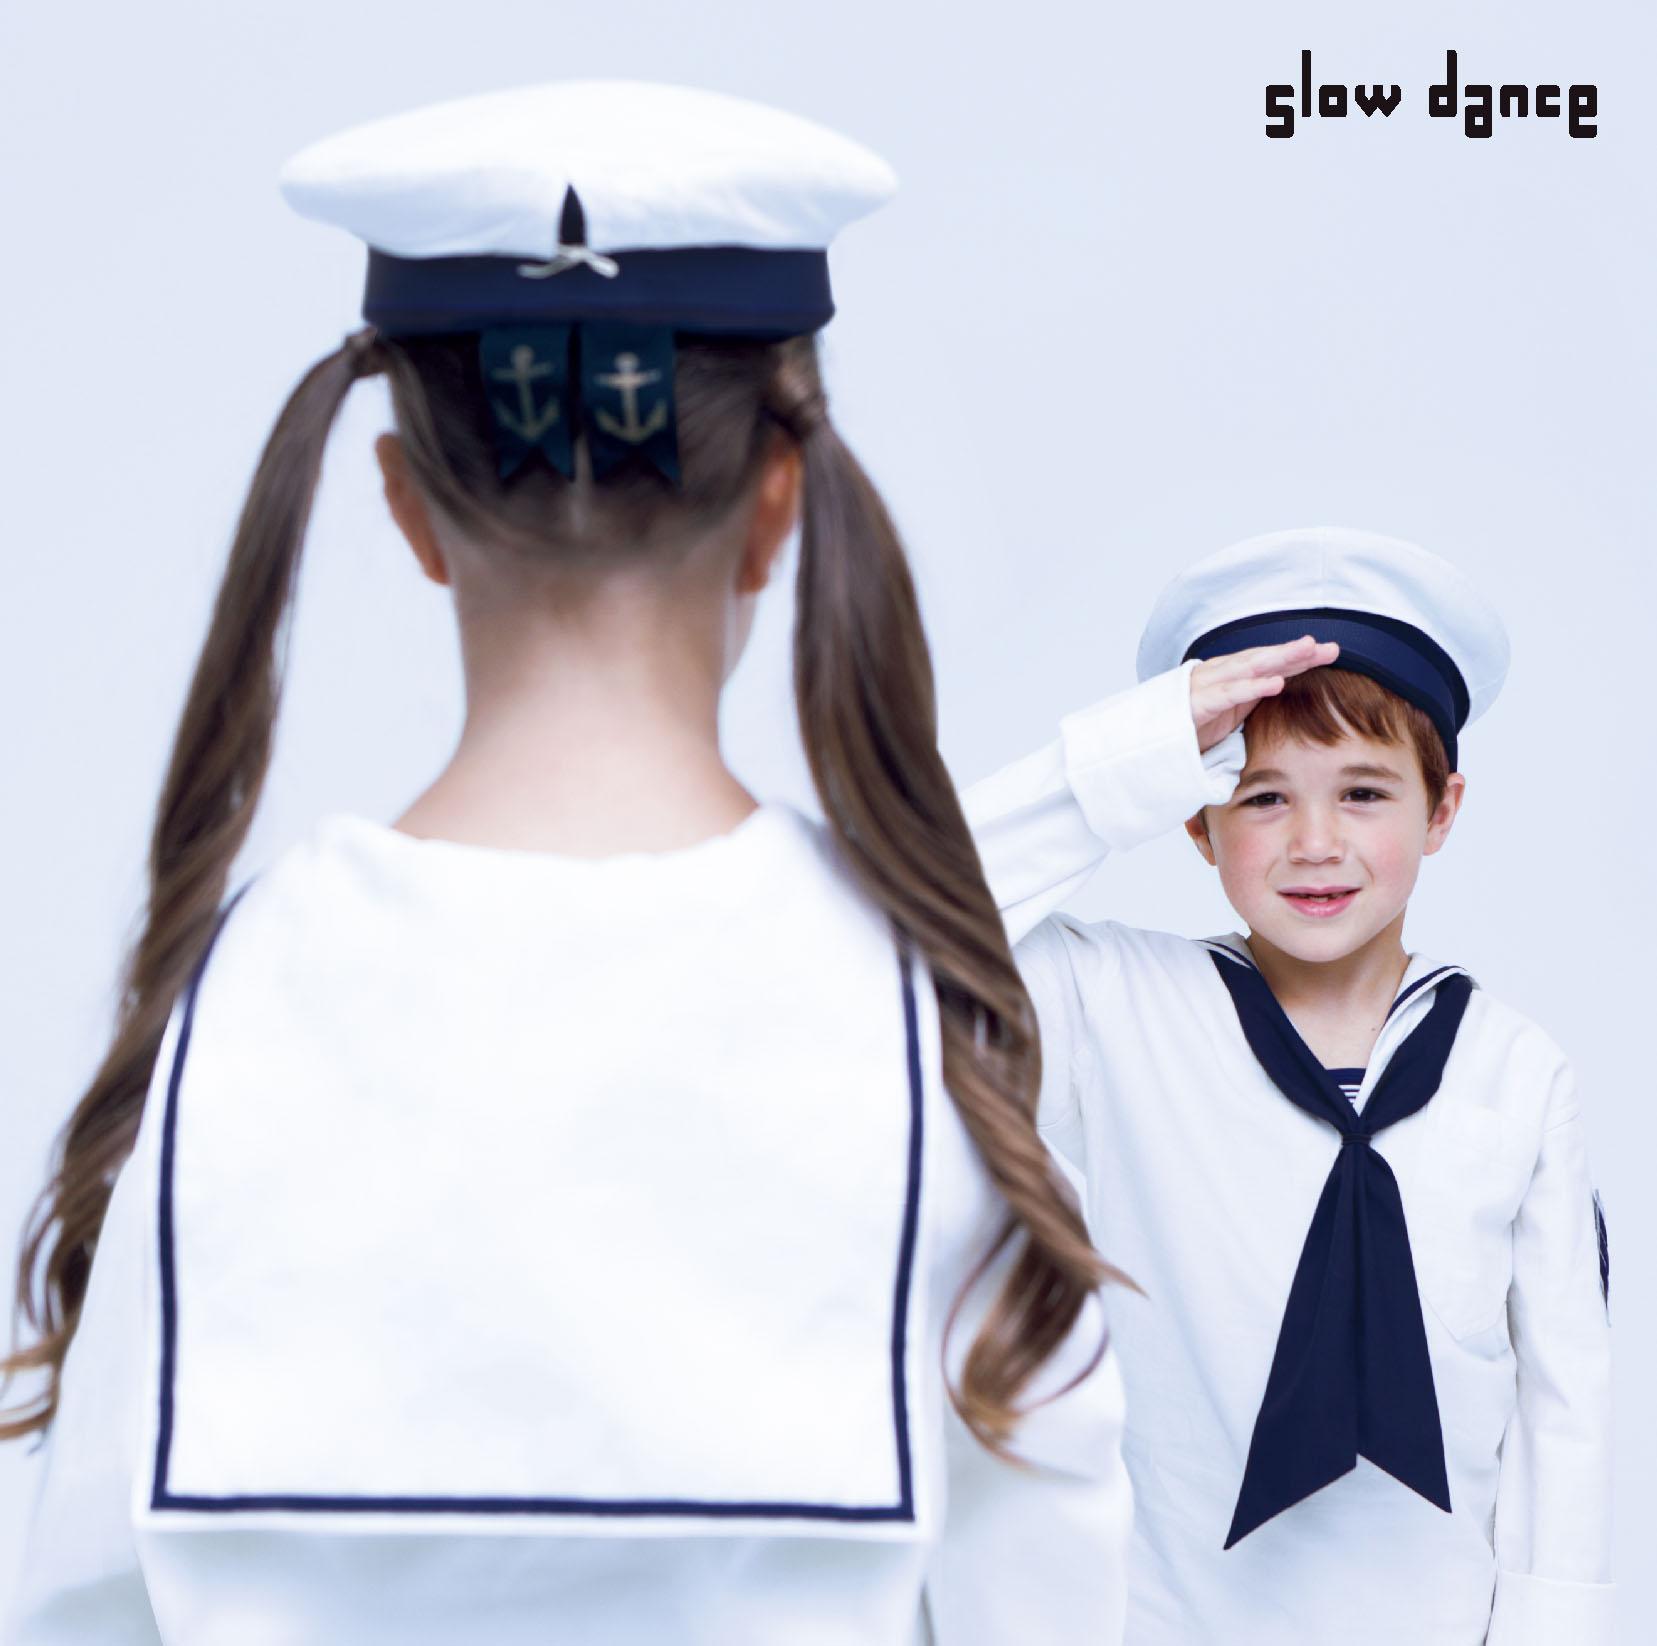 slow dance KICM1418